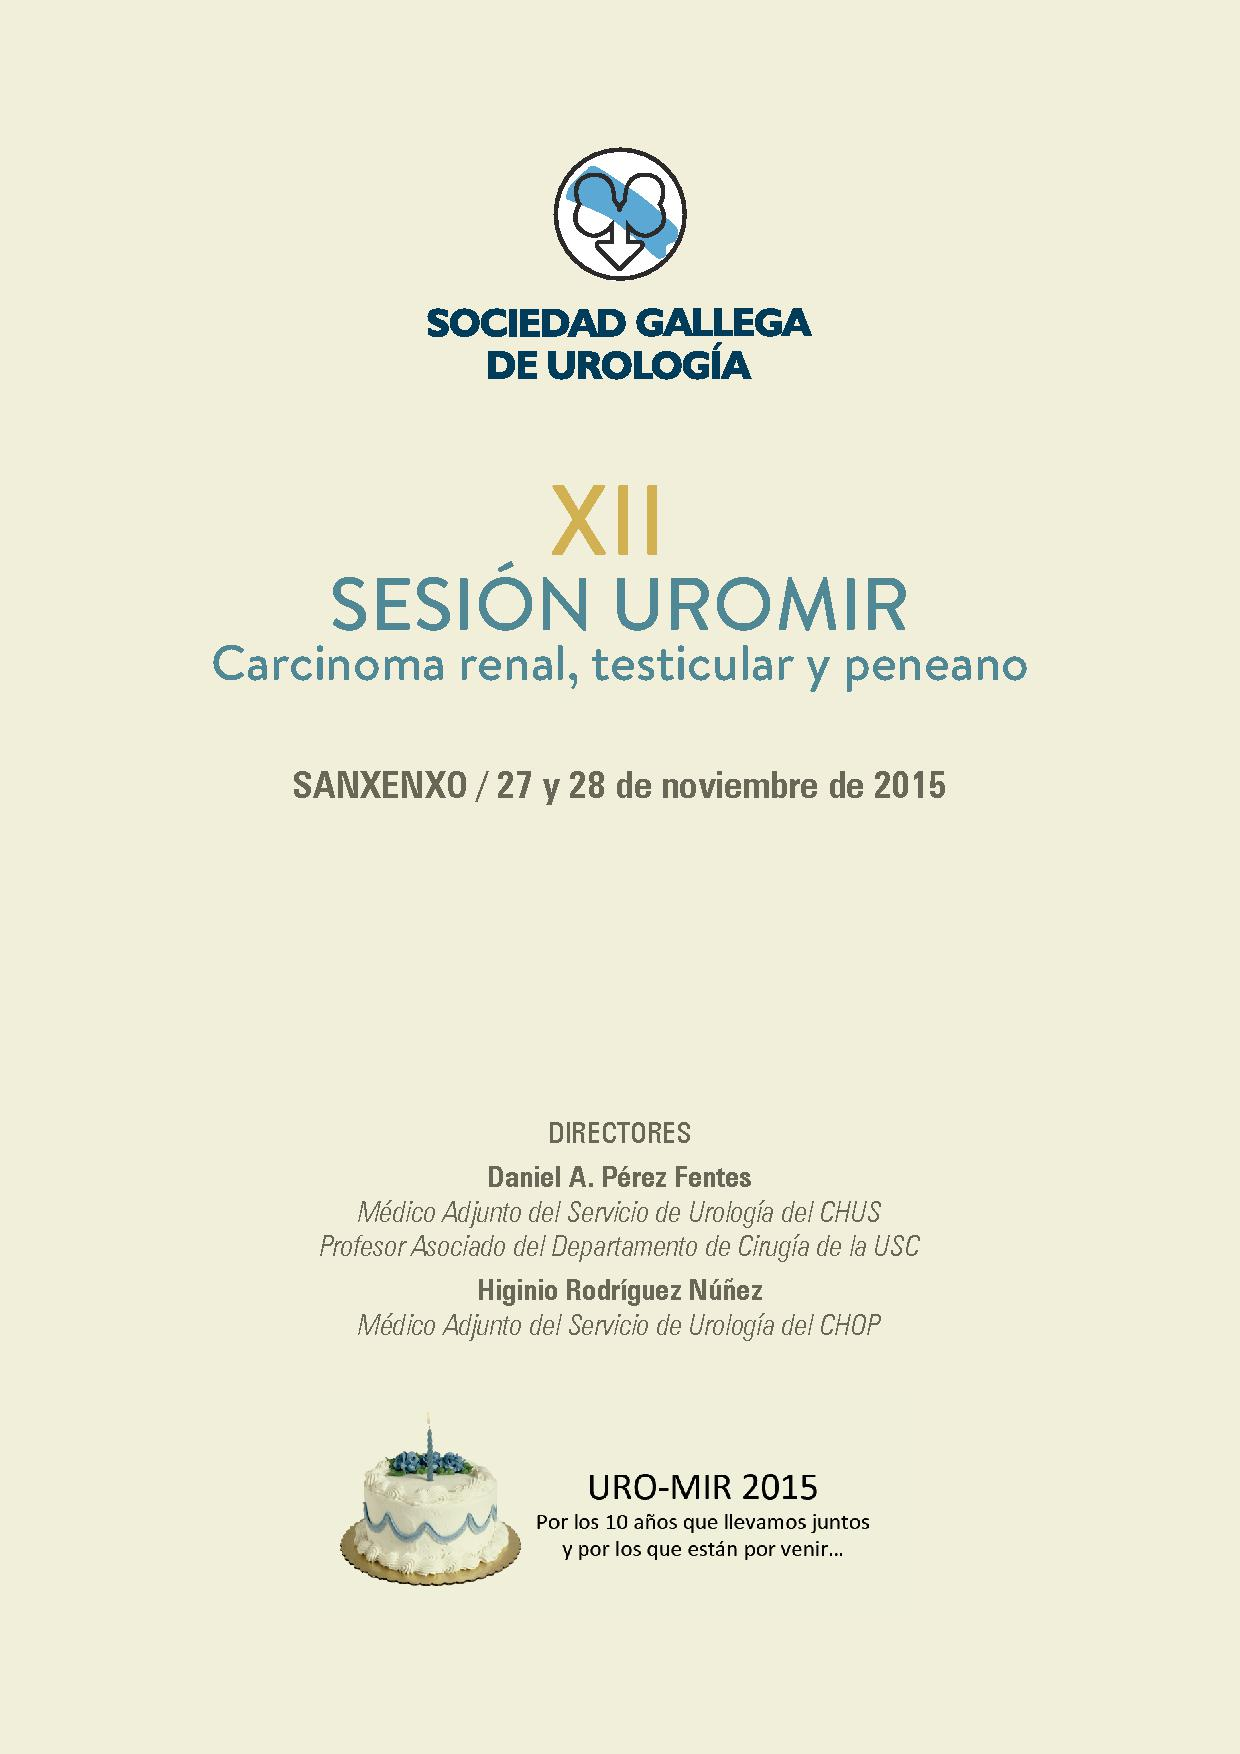 XII Sesión UROMIR 2015